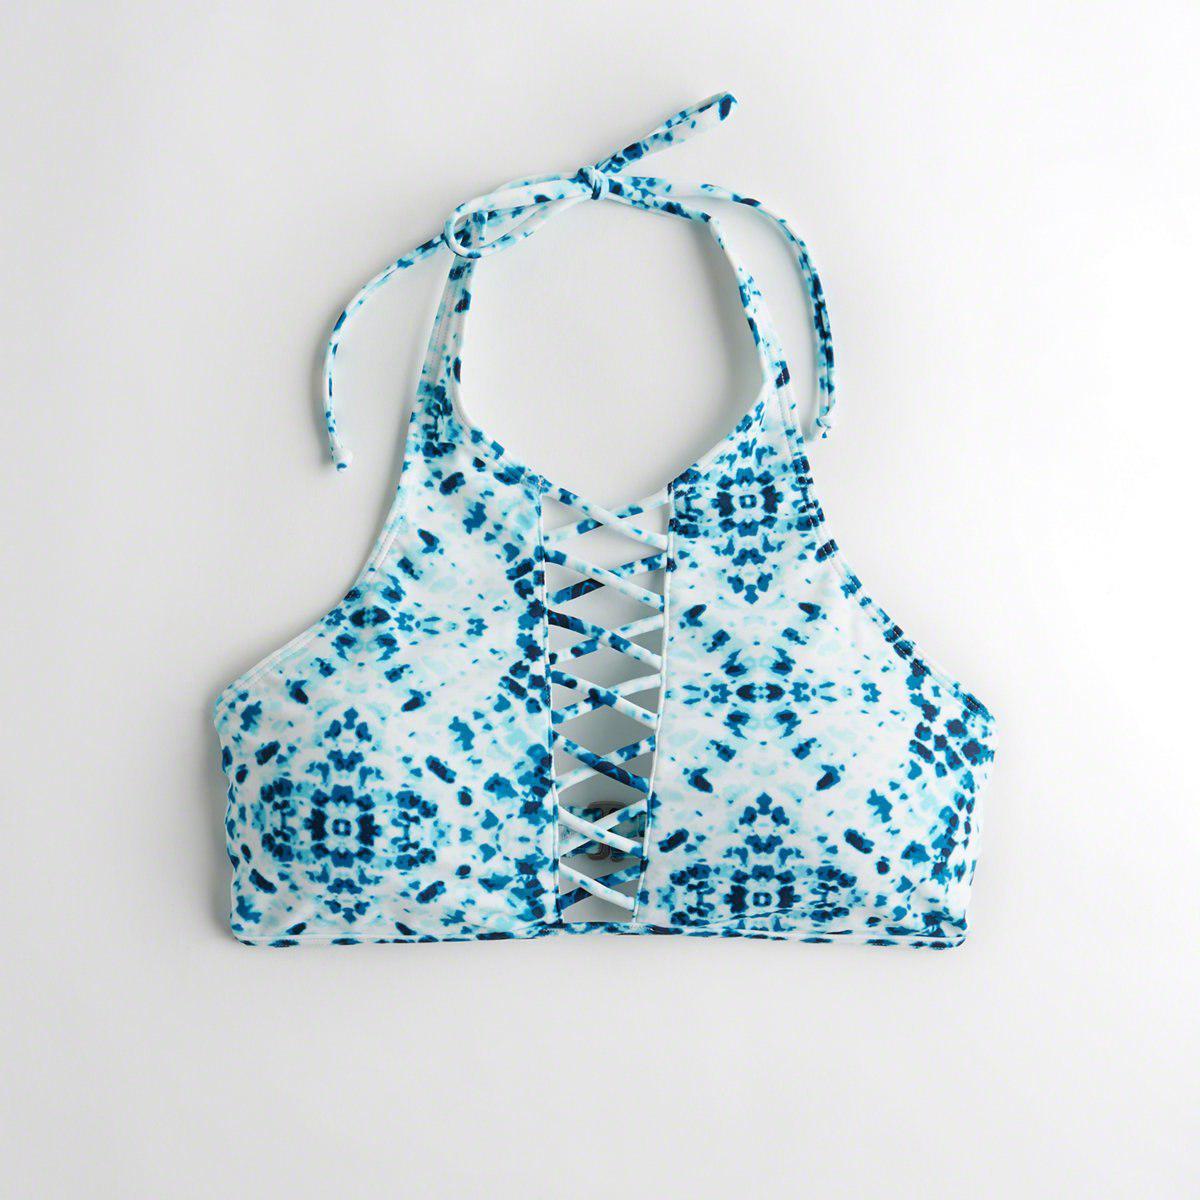 cab6e93e42169a Hollister. Women s Blue Girls Strappy Halter High-neck Bikini Top From  Hollister